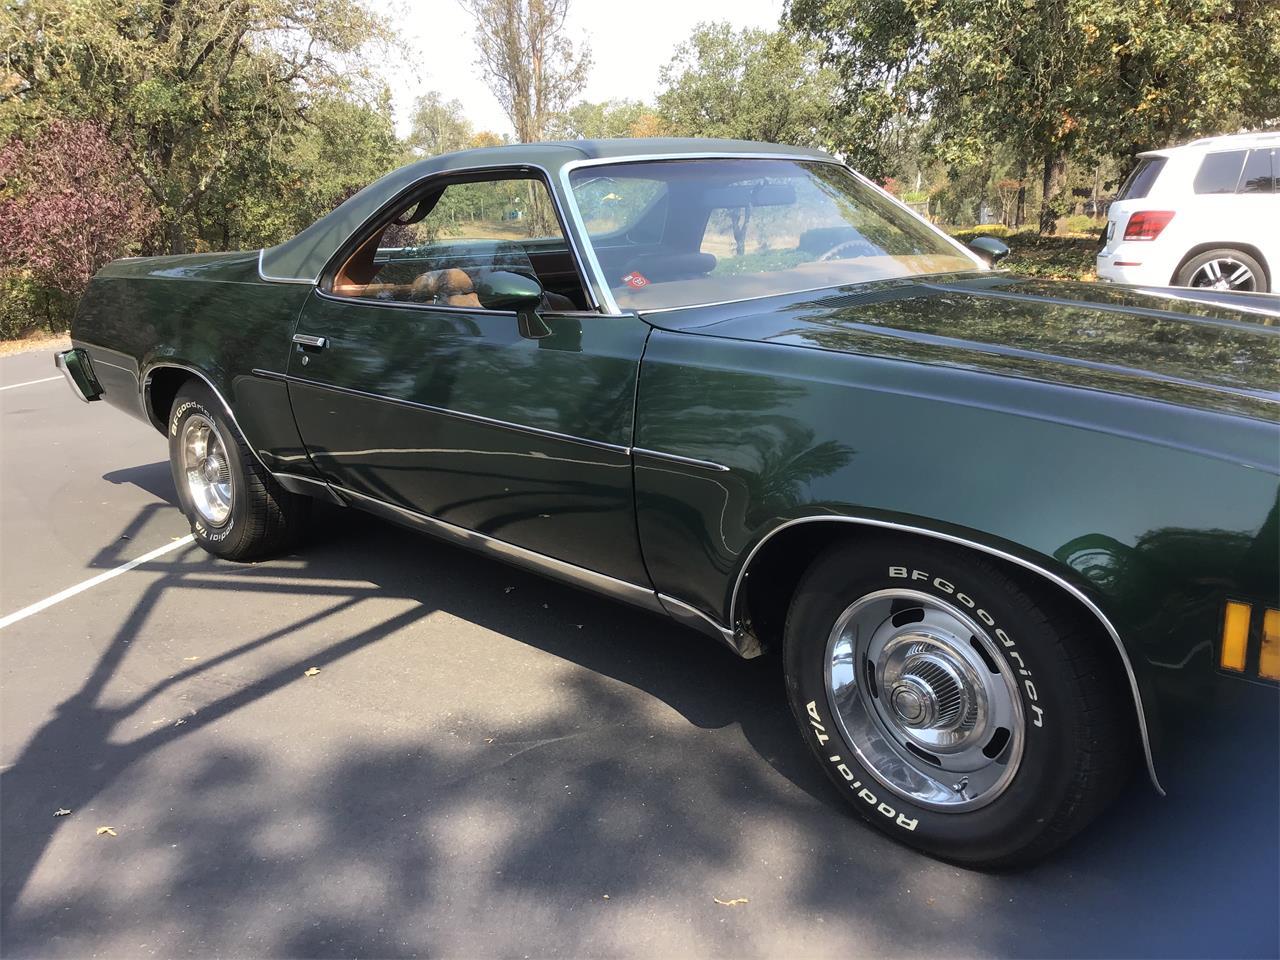 1975 Chevrolet El Camino (CC-1393642) for sale in Santa Rosa, California